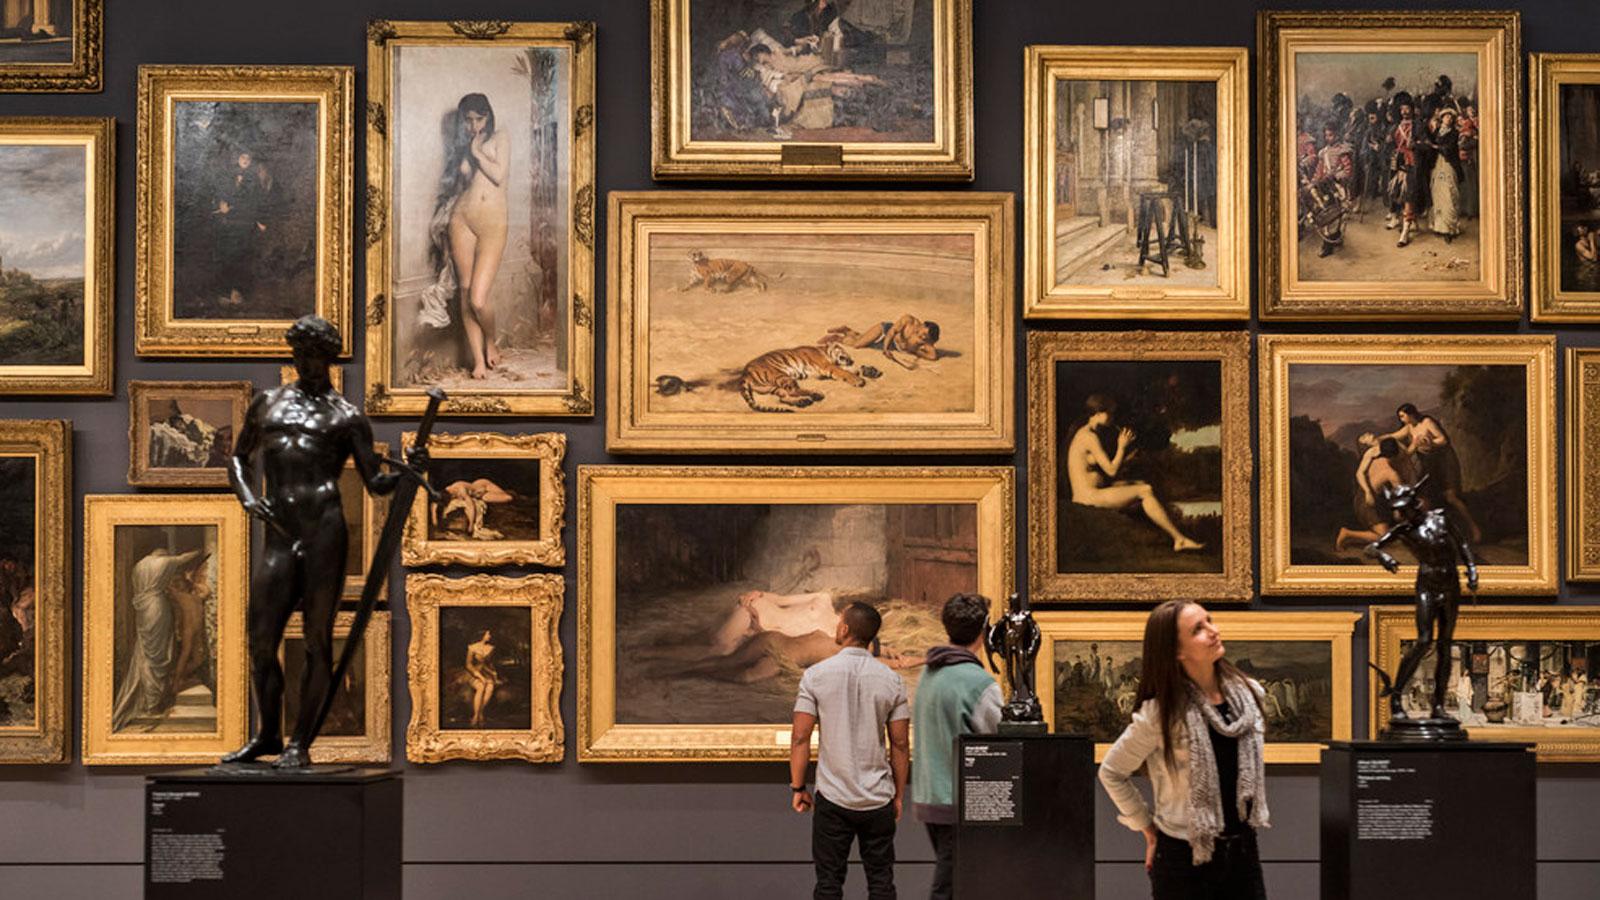 NGV International, National Gallery of Victoria, Melbourne, Victoria, Australia